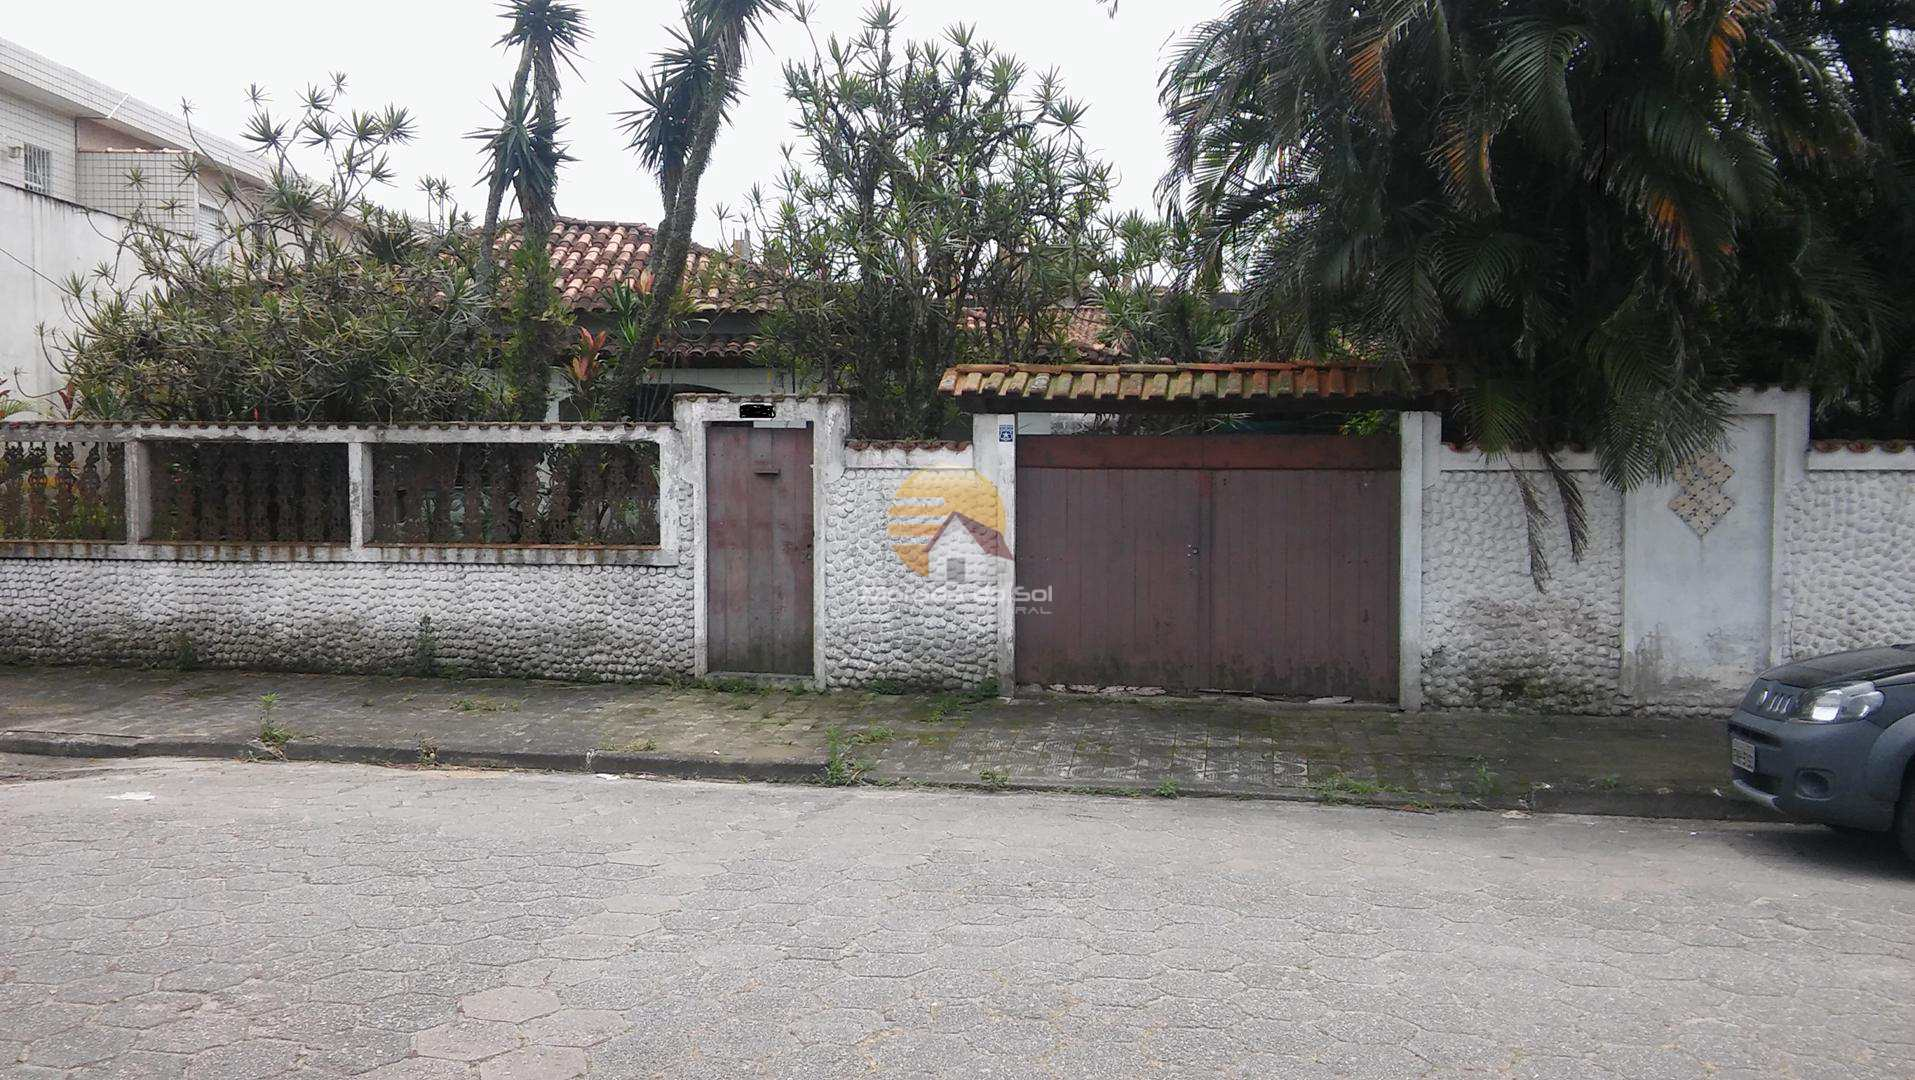 Terreno, Guilhermina, Praia Grande - R$ 650.000,00, 540m² - Codigo: 4180